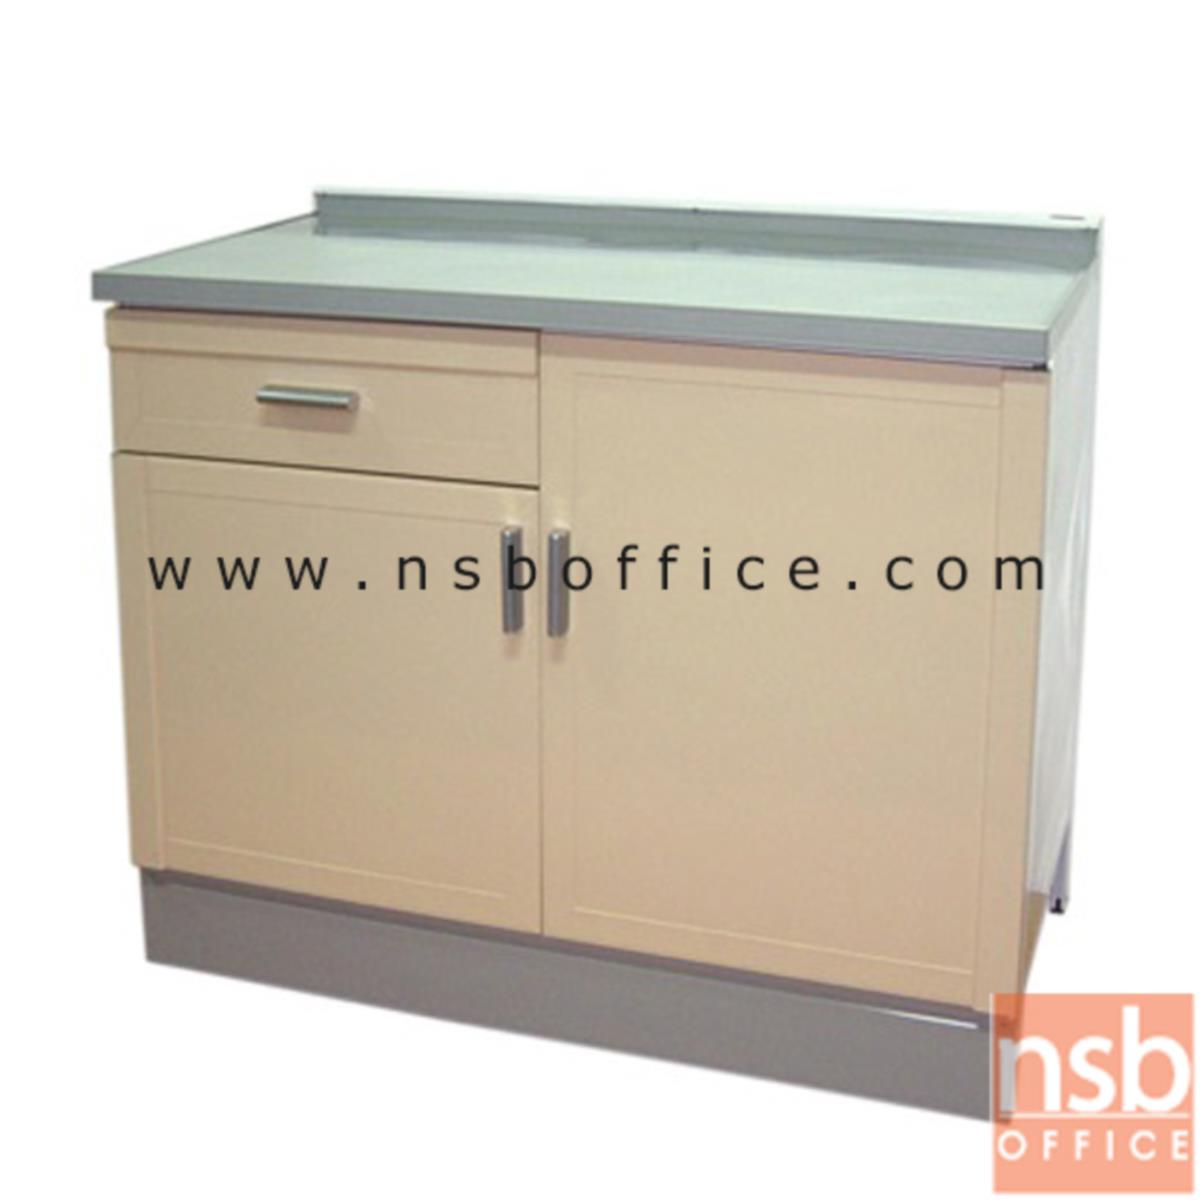 G07A075:ตู้เคาน์เตอร์หน้าเรียบ รุ่น MT1015 ขนาด 100 (2 บาน) , 150 (3 บาน) cm.